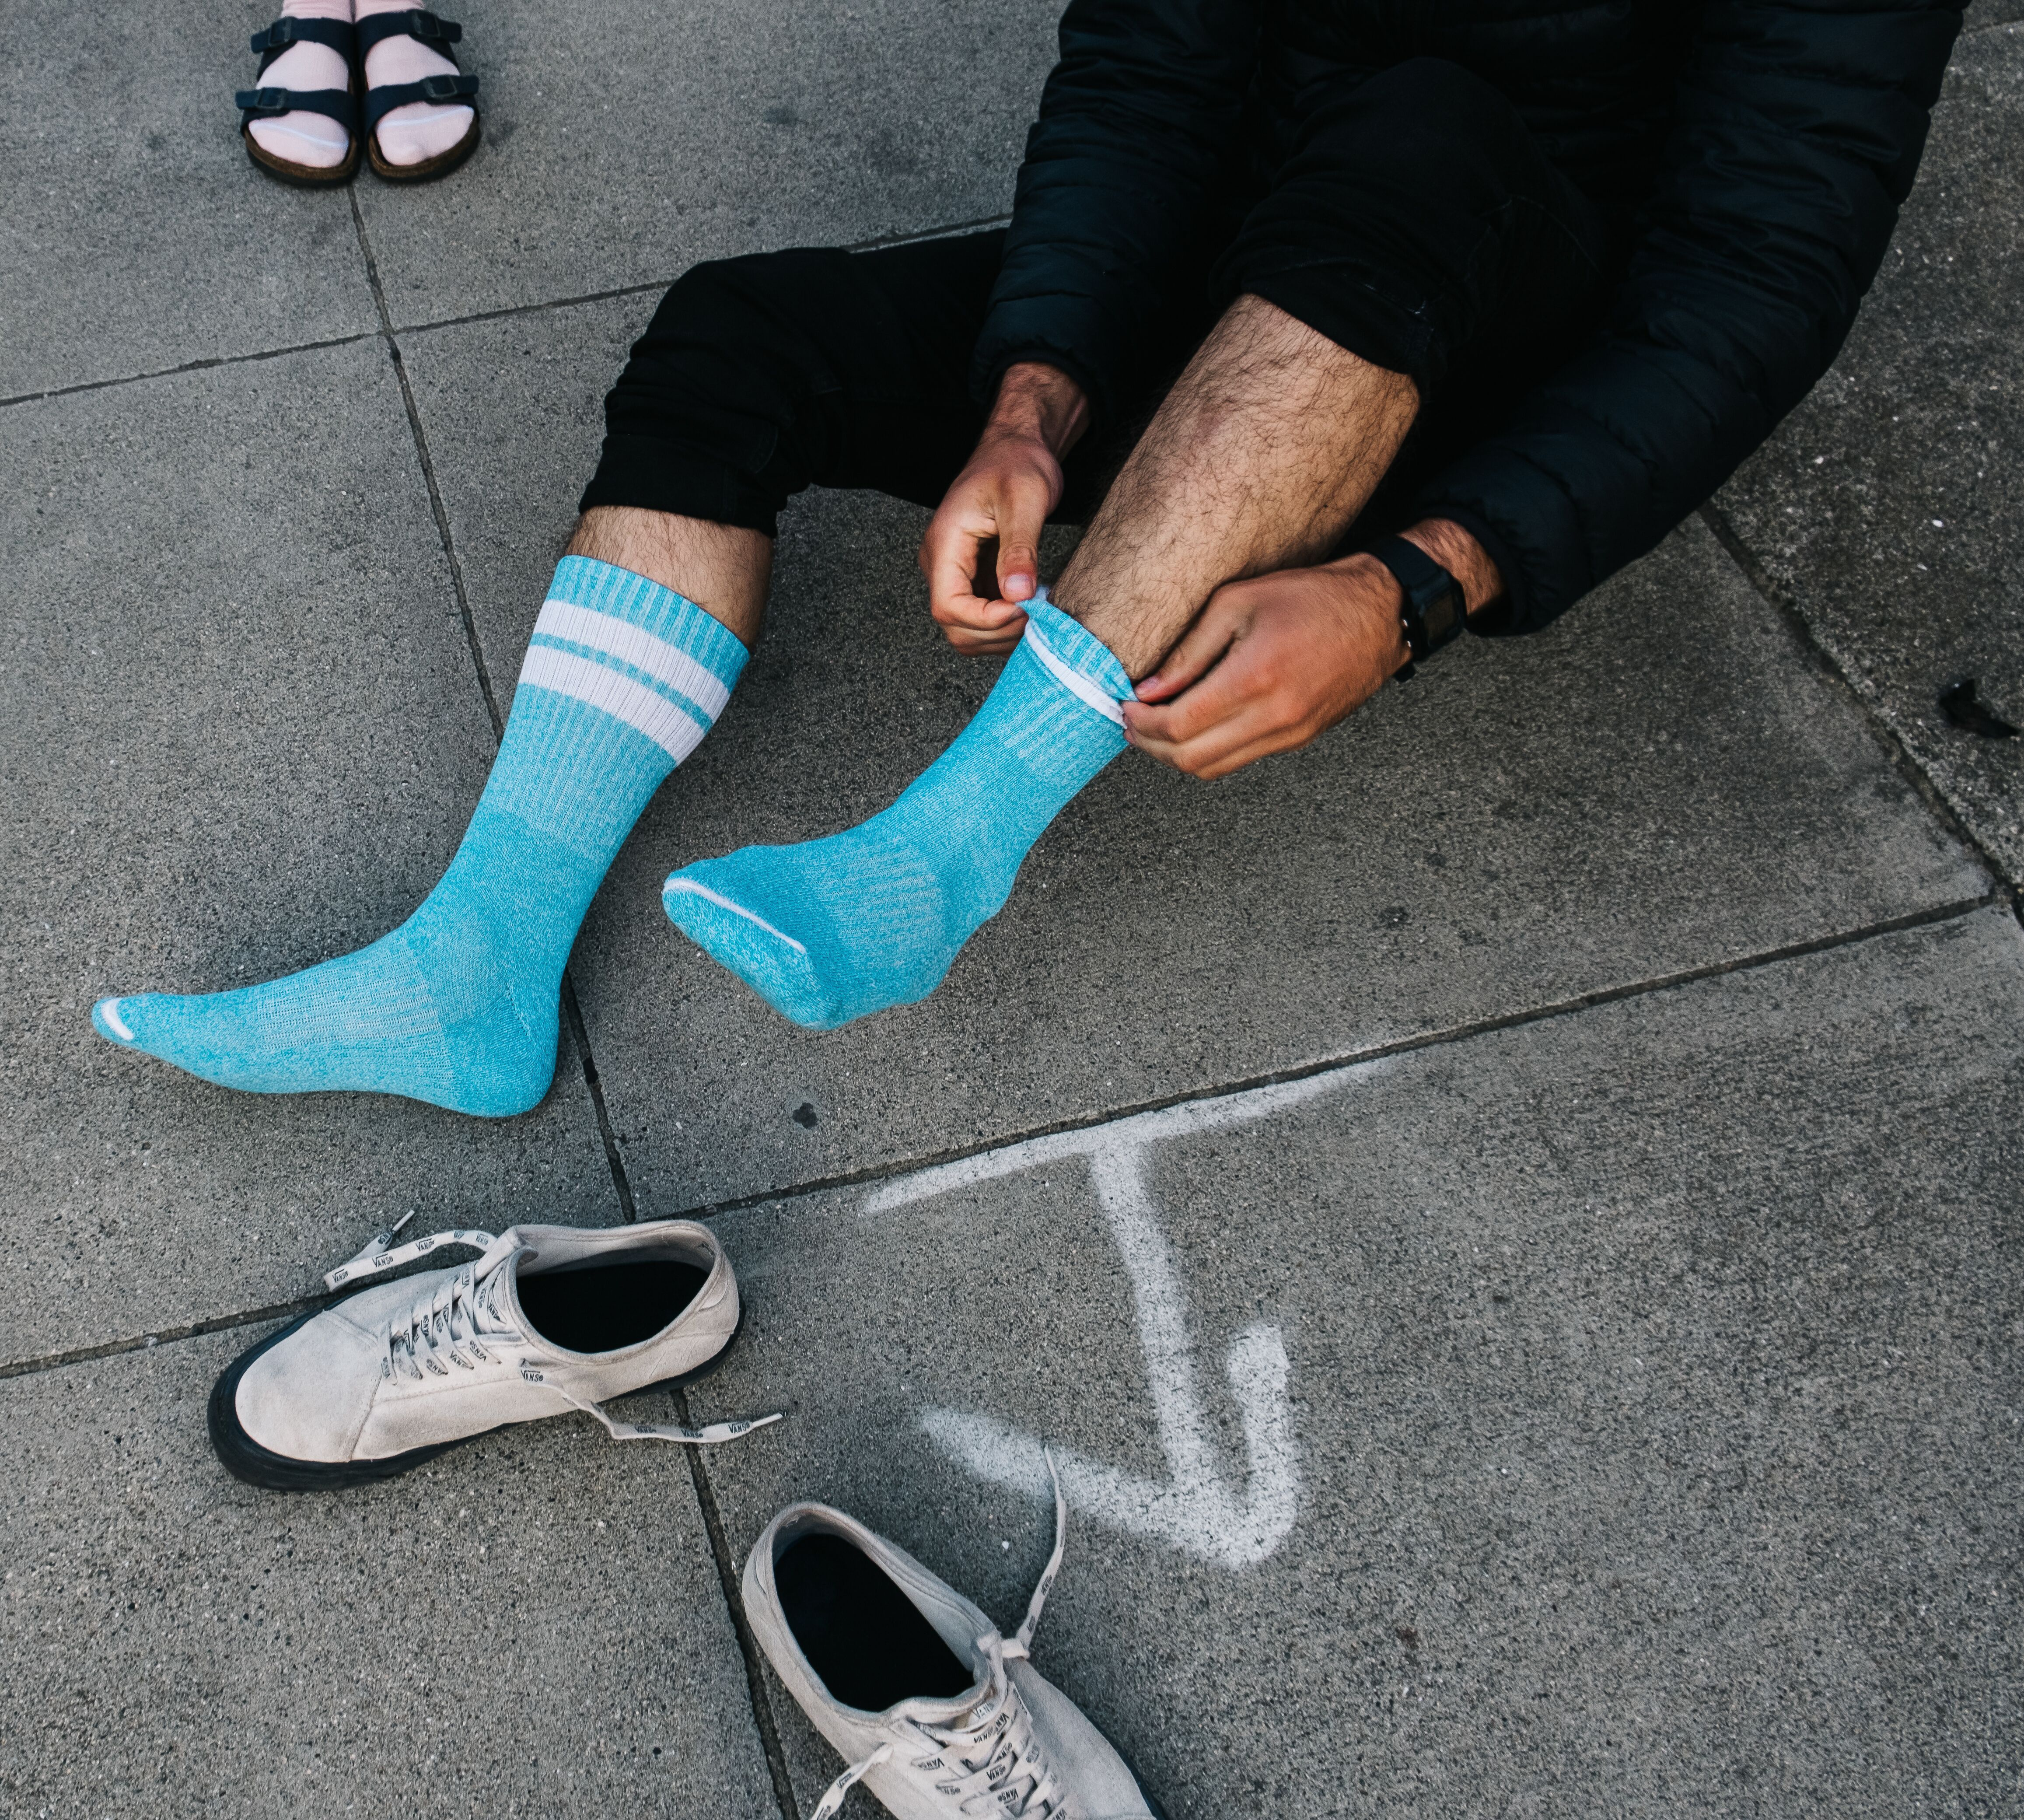 Man putting on Arvin Goods gym socks